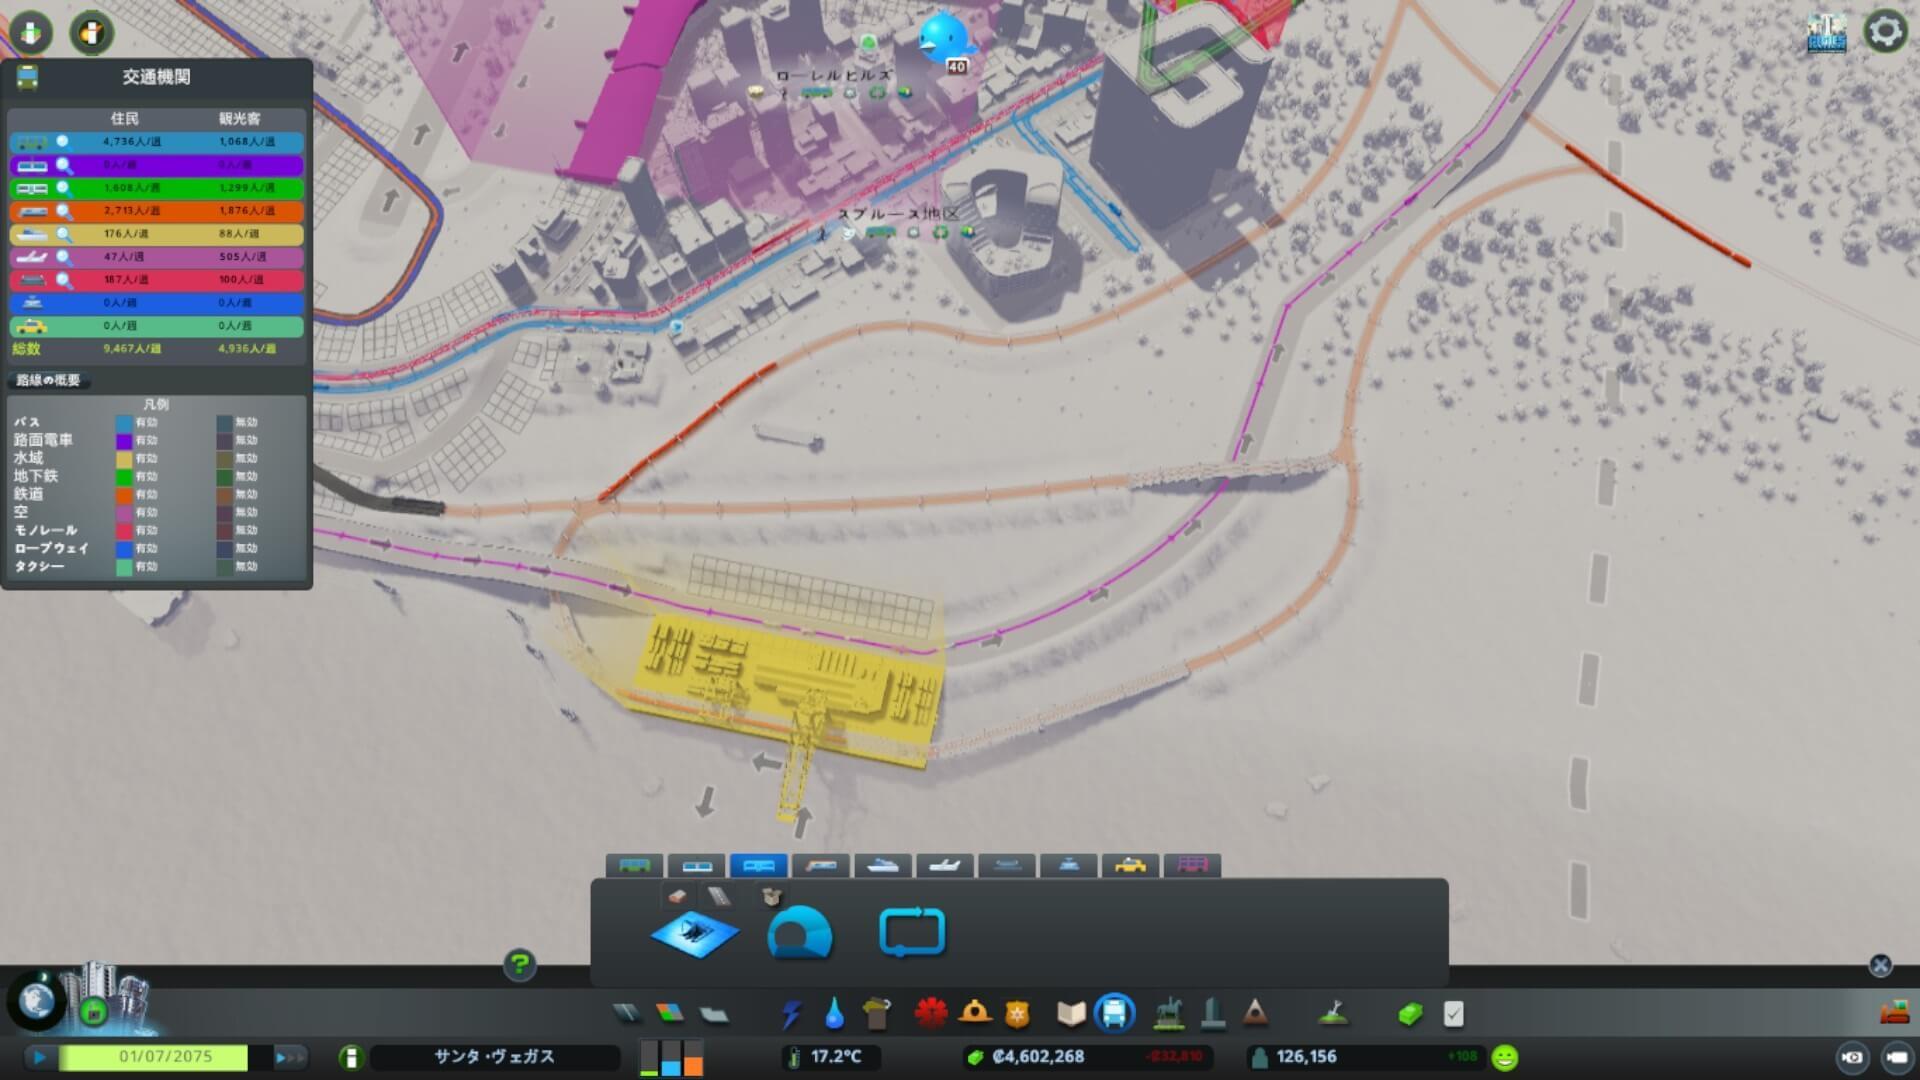 cities-skylines-cargo05-1024x576 【Cities:skylines攻略ブログ】 渋滞しない貨物港駅・貨物ハブの作り方 Cities:Skylines(シティーズ:スカイライン ) 街作りシミュレーションゲーム